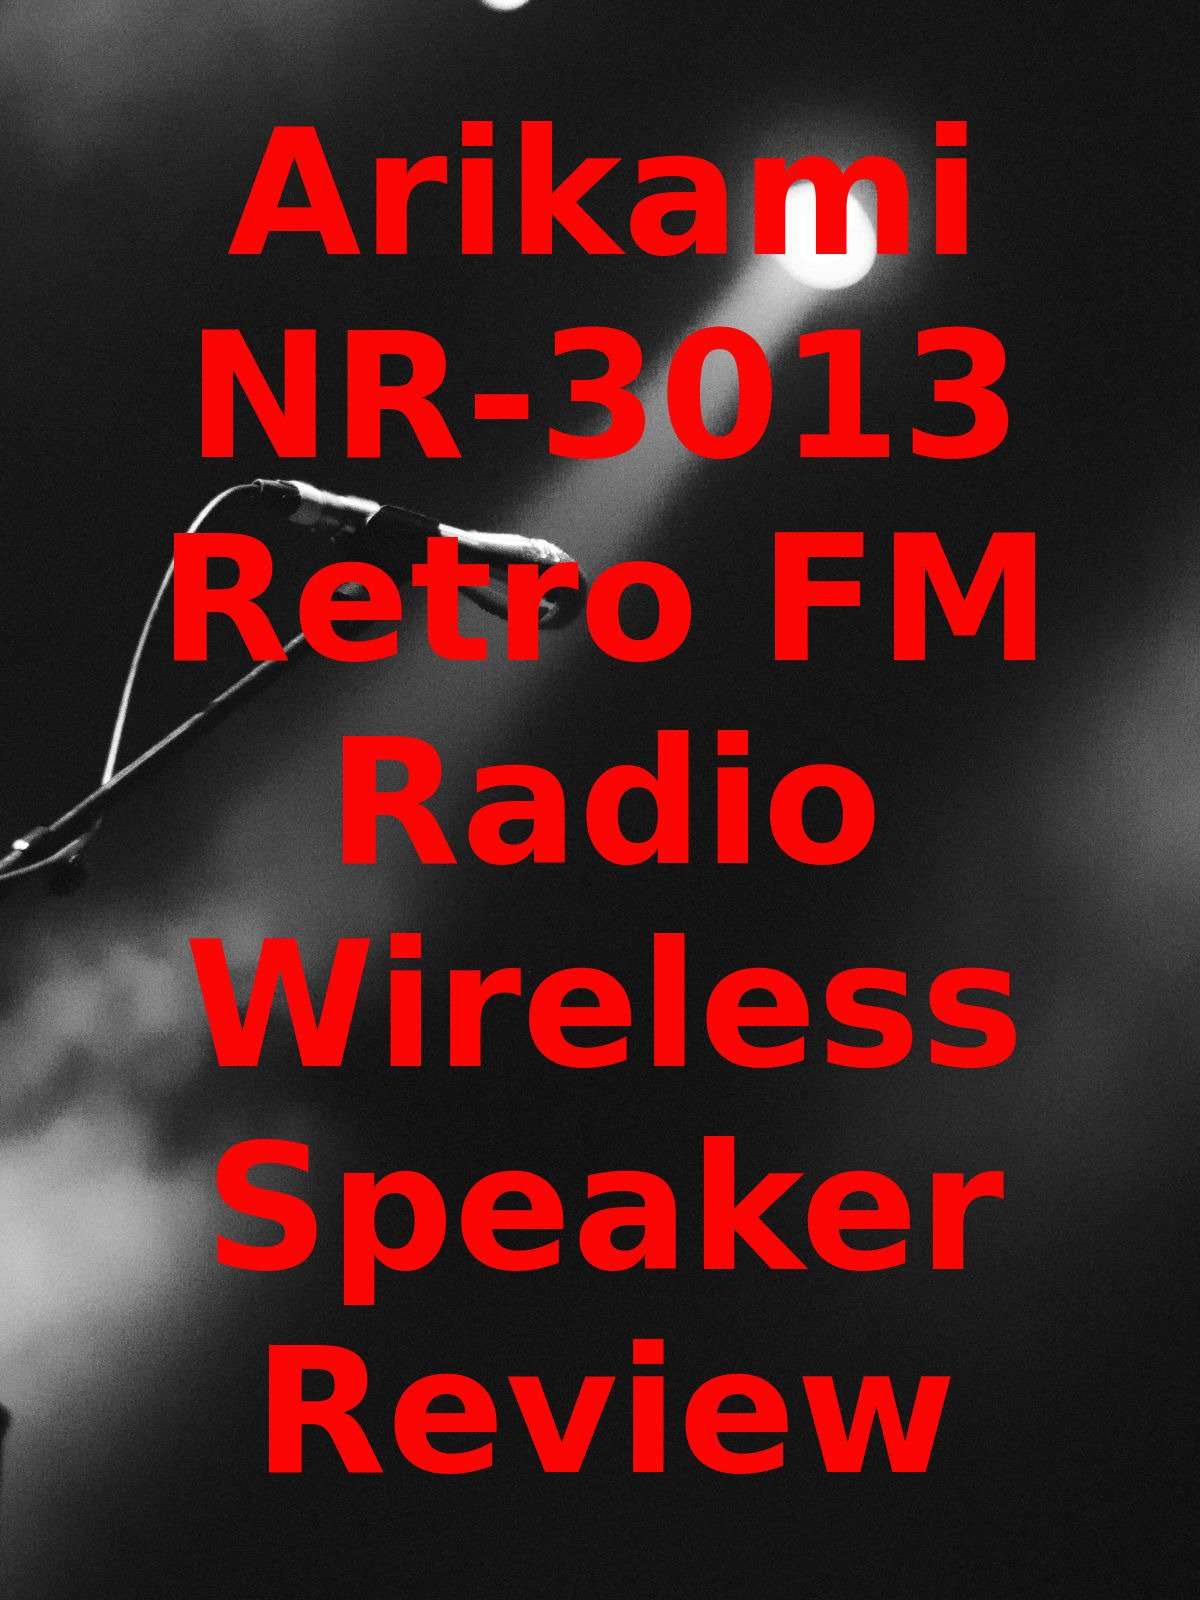 Review: Arikami NR-3013 Retro FM Radio Wireless Speaker Review